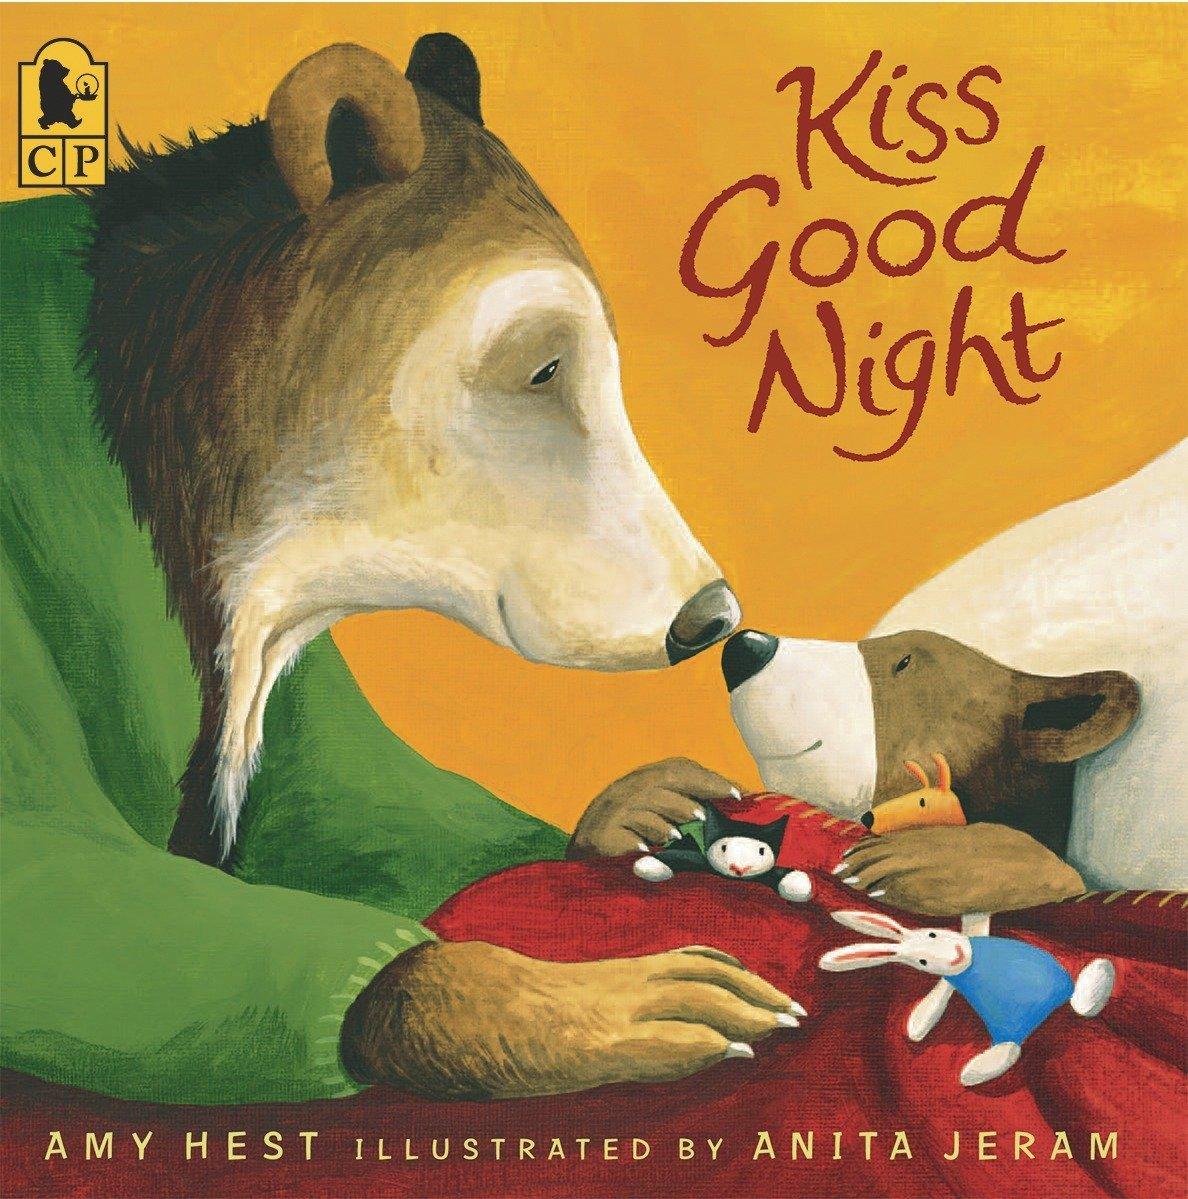 Kiss Good Night Sam Books Amy Hest Anita Jeram 9780763621148